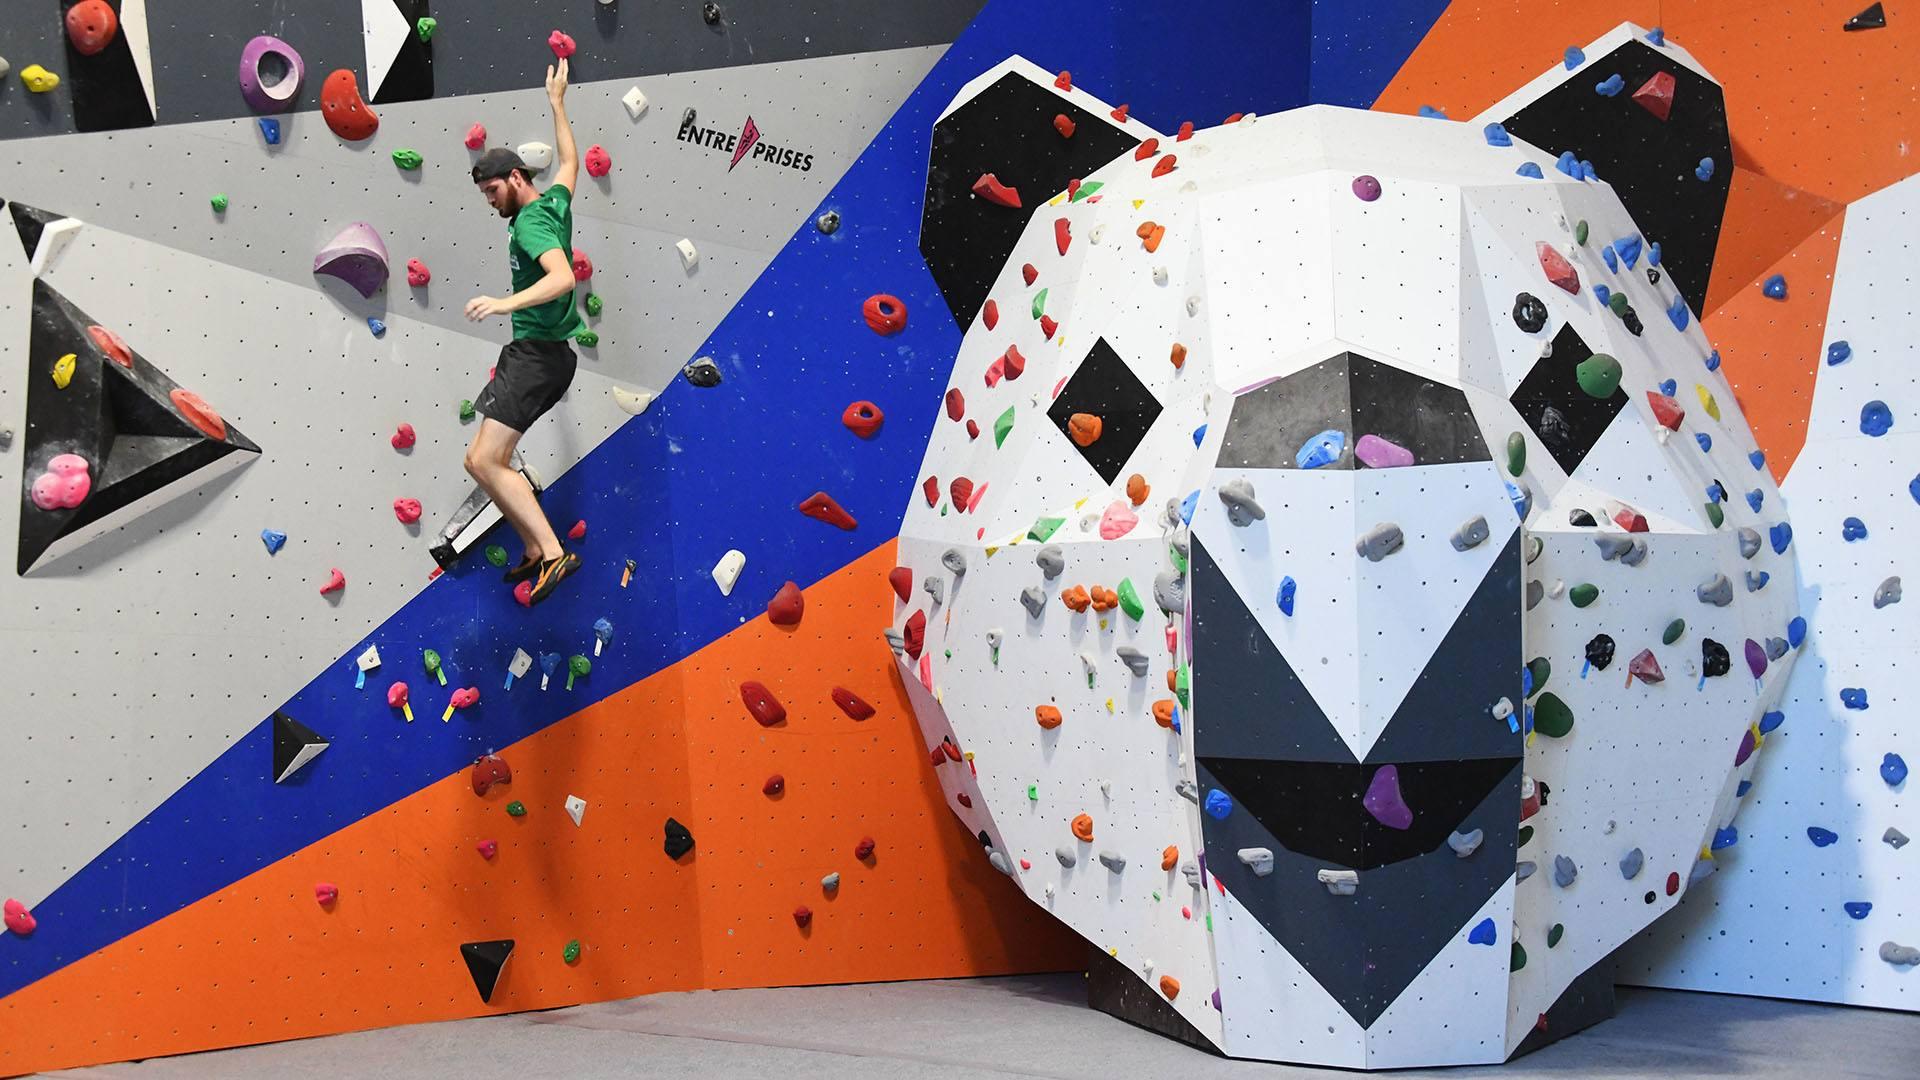 Climbing Mulhouse Center, on grimpe et on accroche : on s'accroche à Nanuk